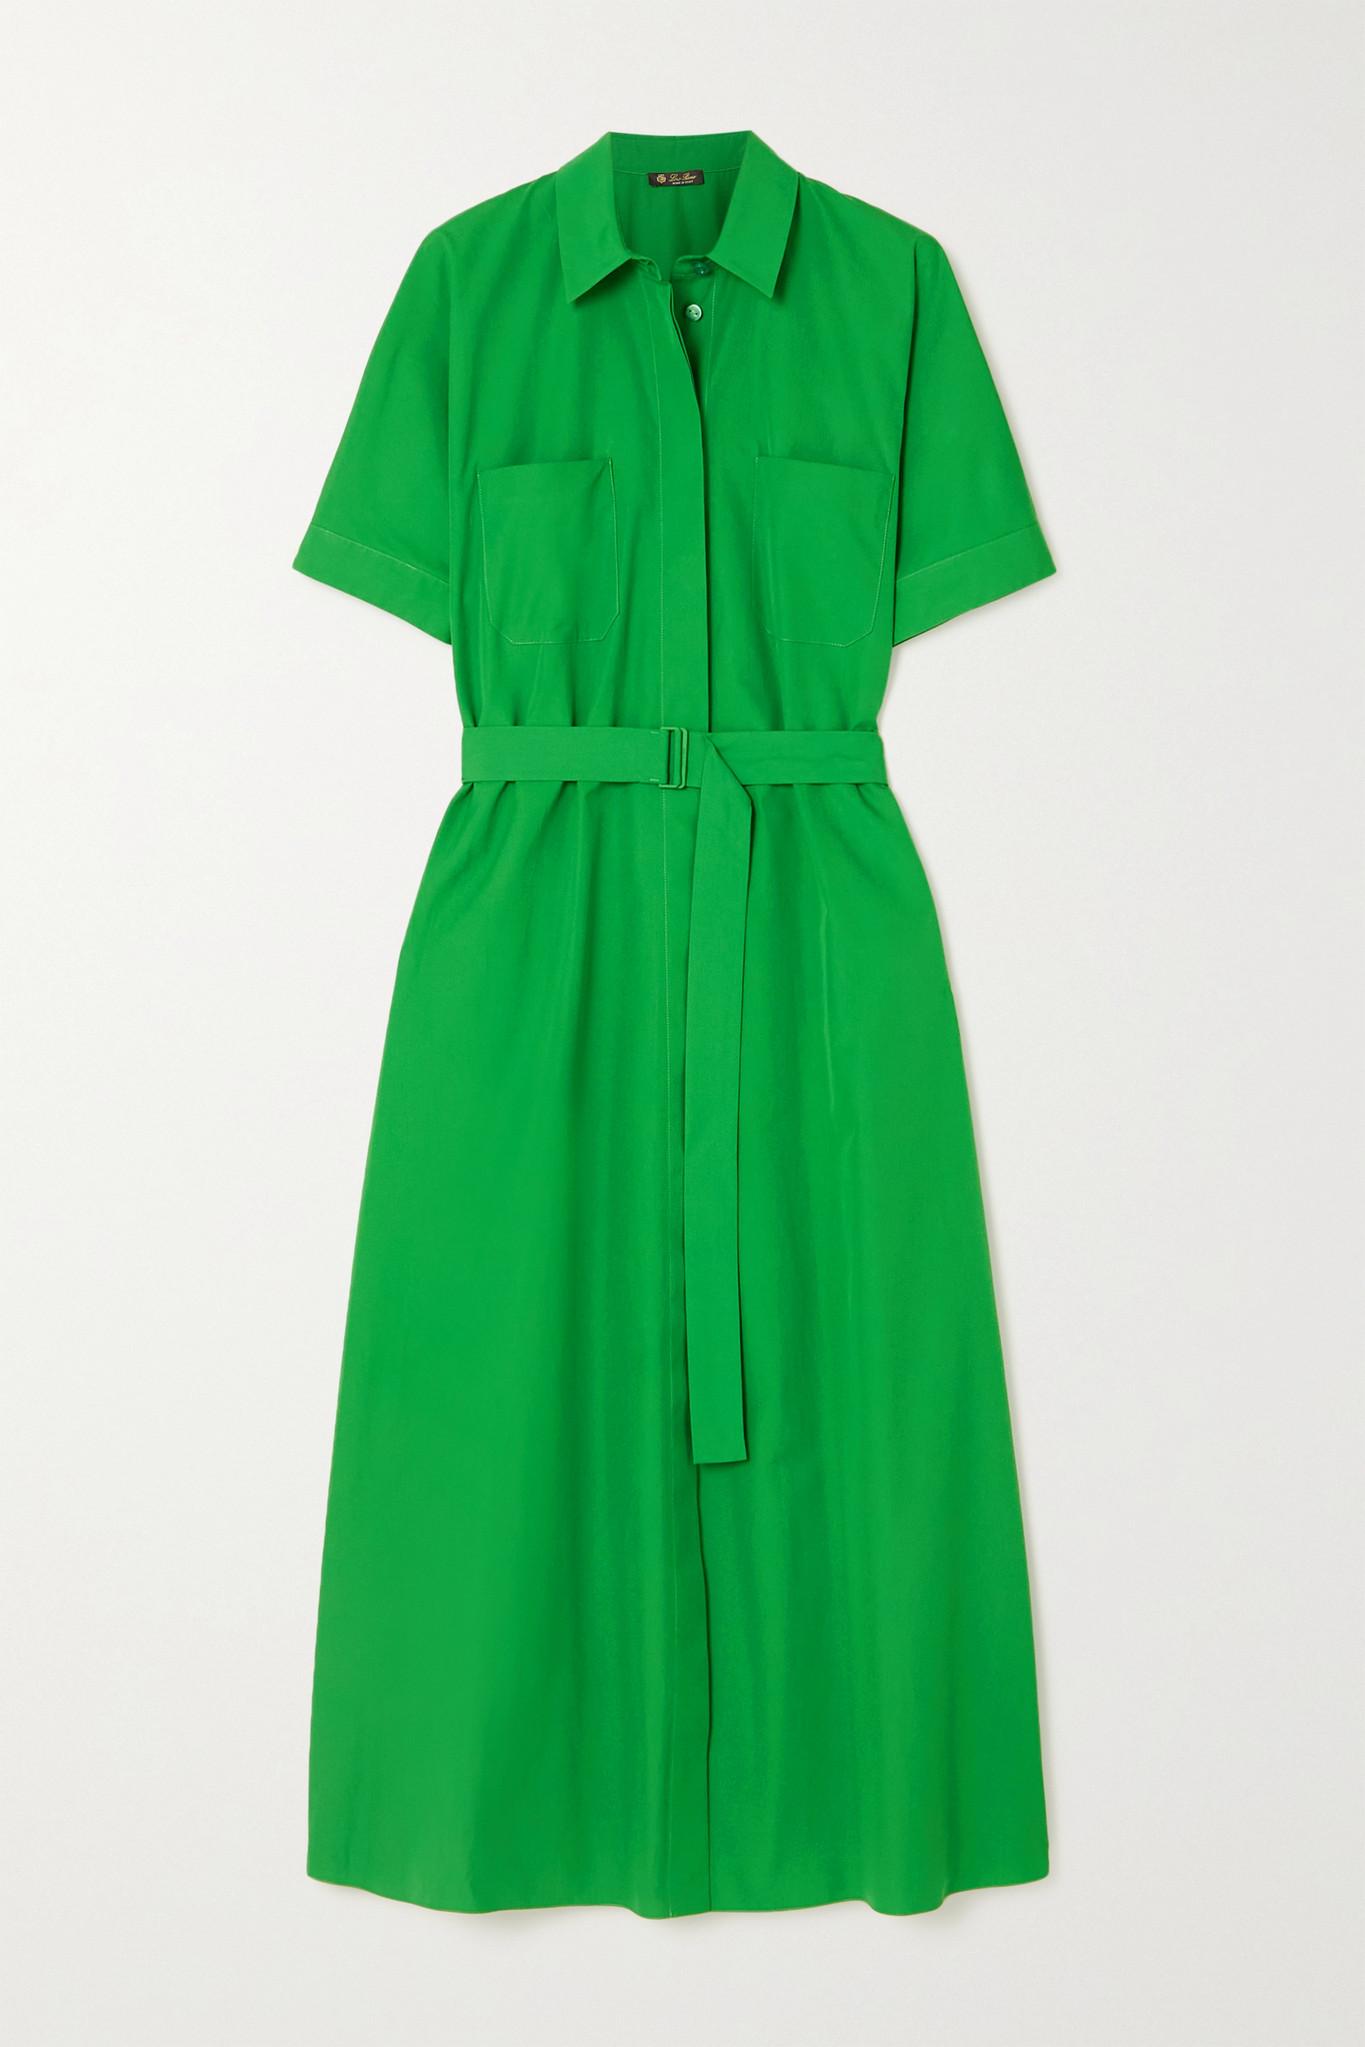 LORO PIANA - Miranda 配腰带棉质府绸中长衬衫式连衣裙 - 绿色 - small